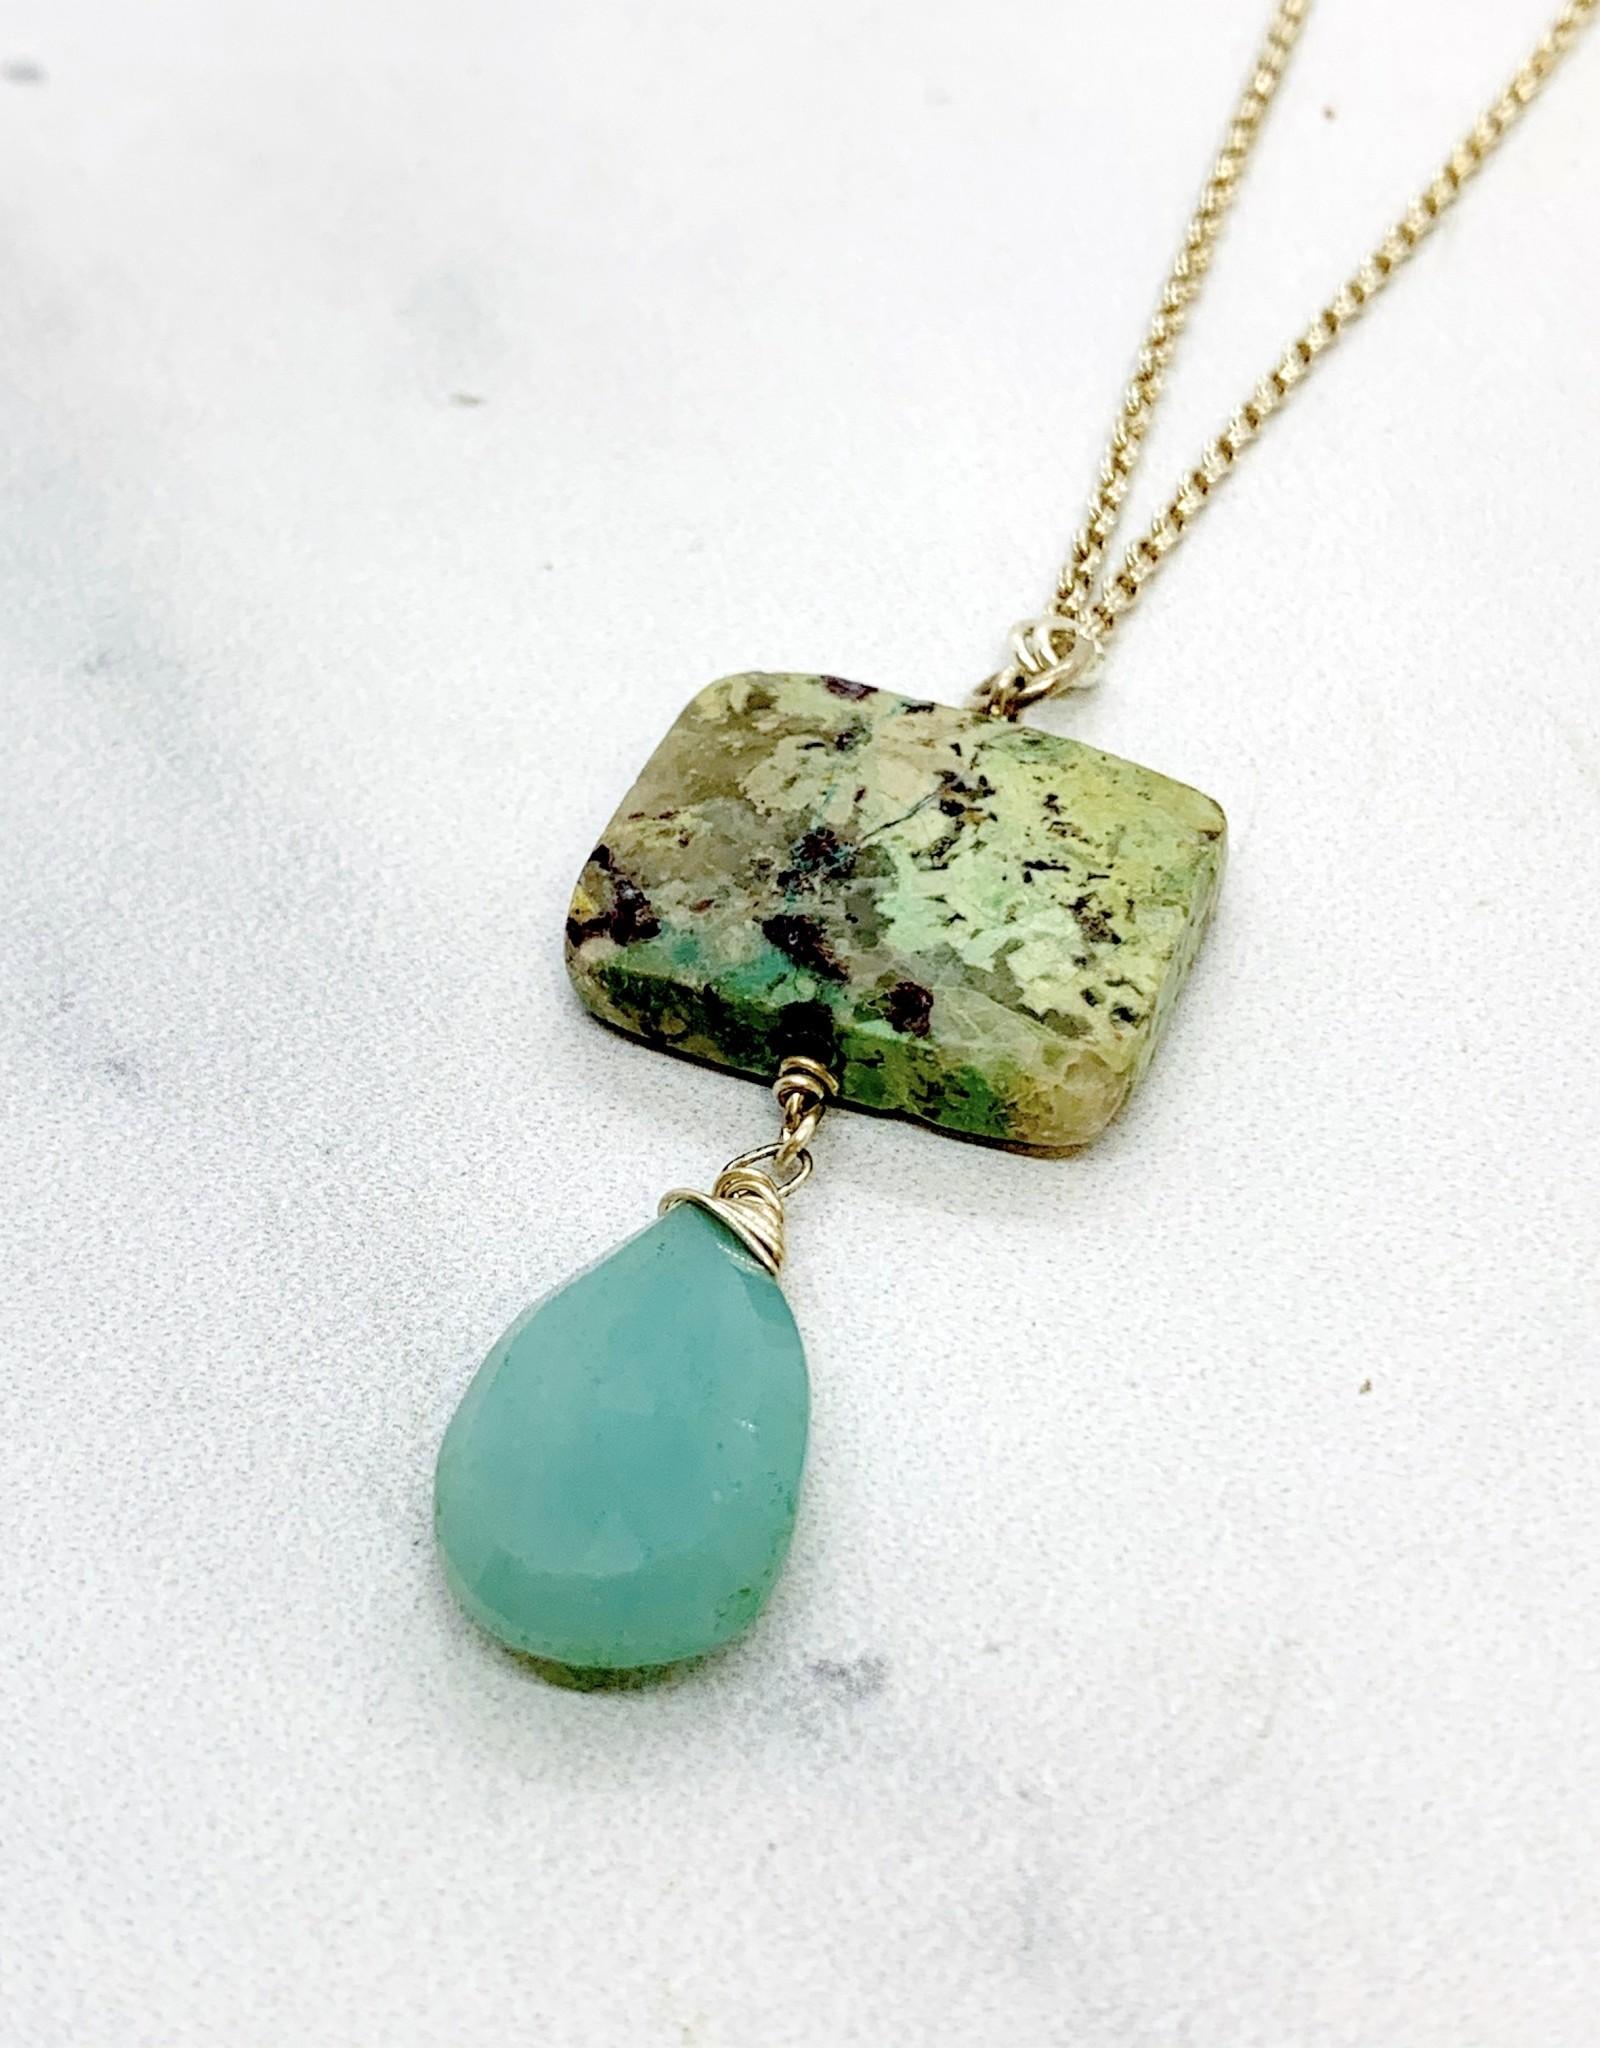 Handmade Silver Necklace with amazonite briolette, chrysocolla square